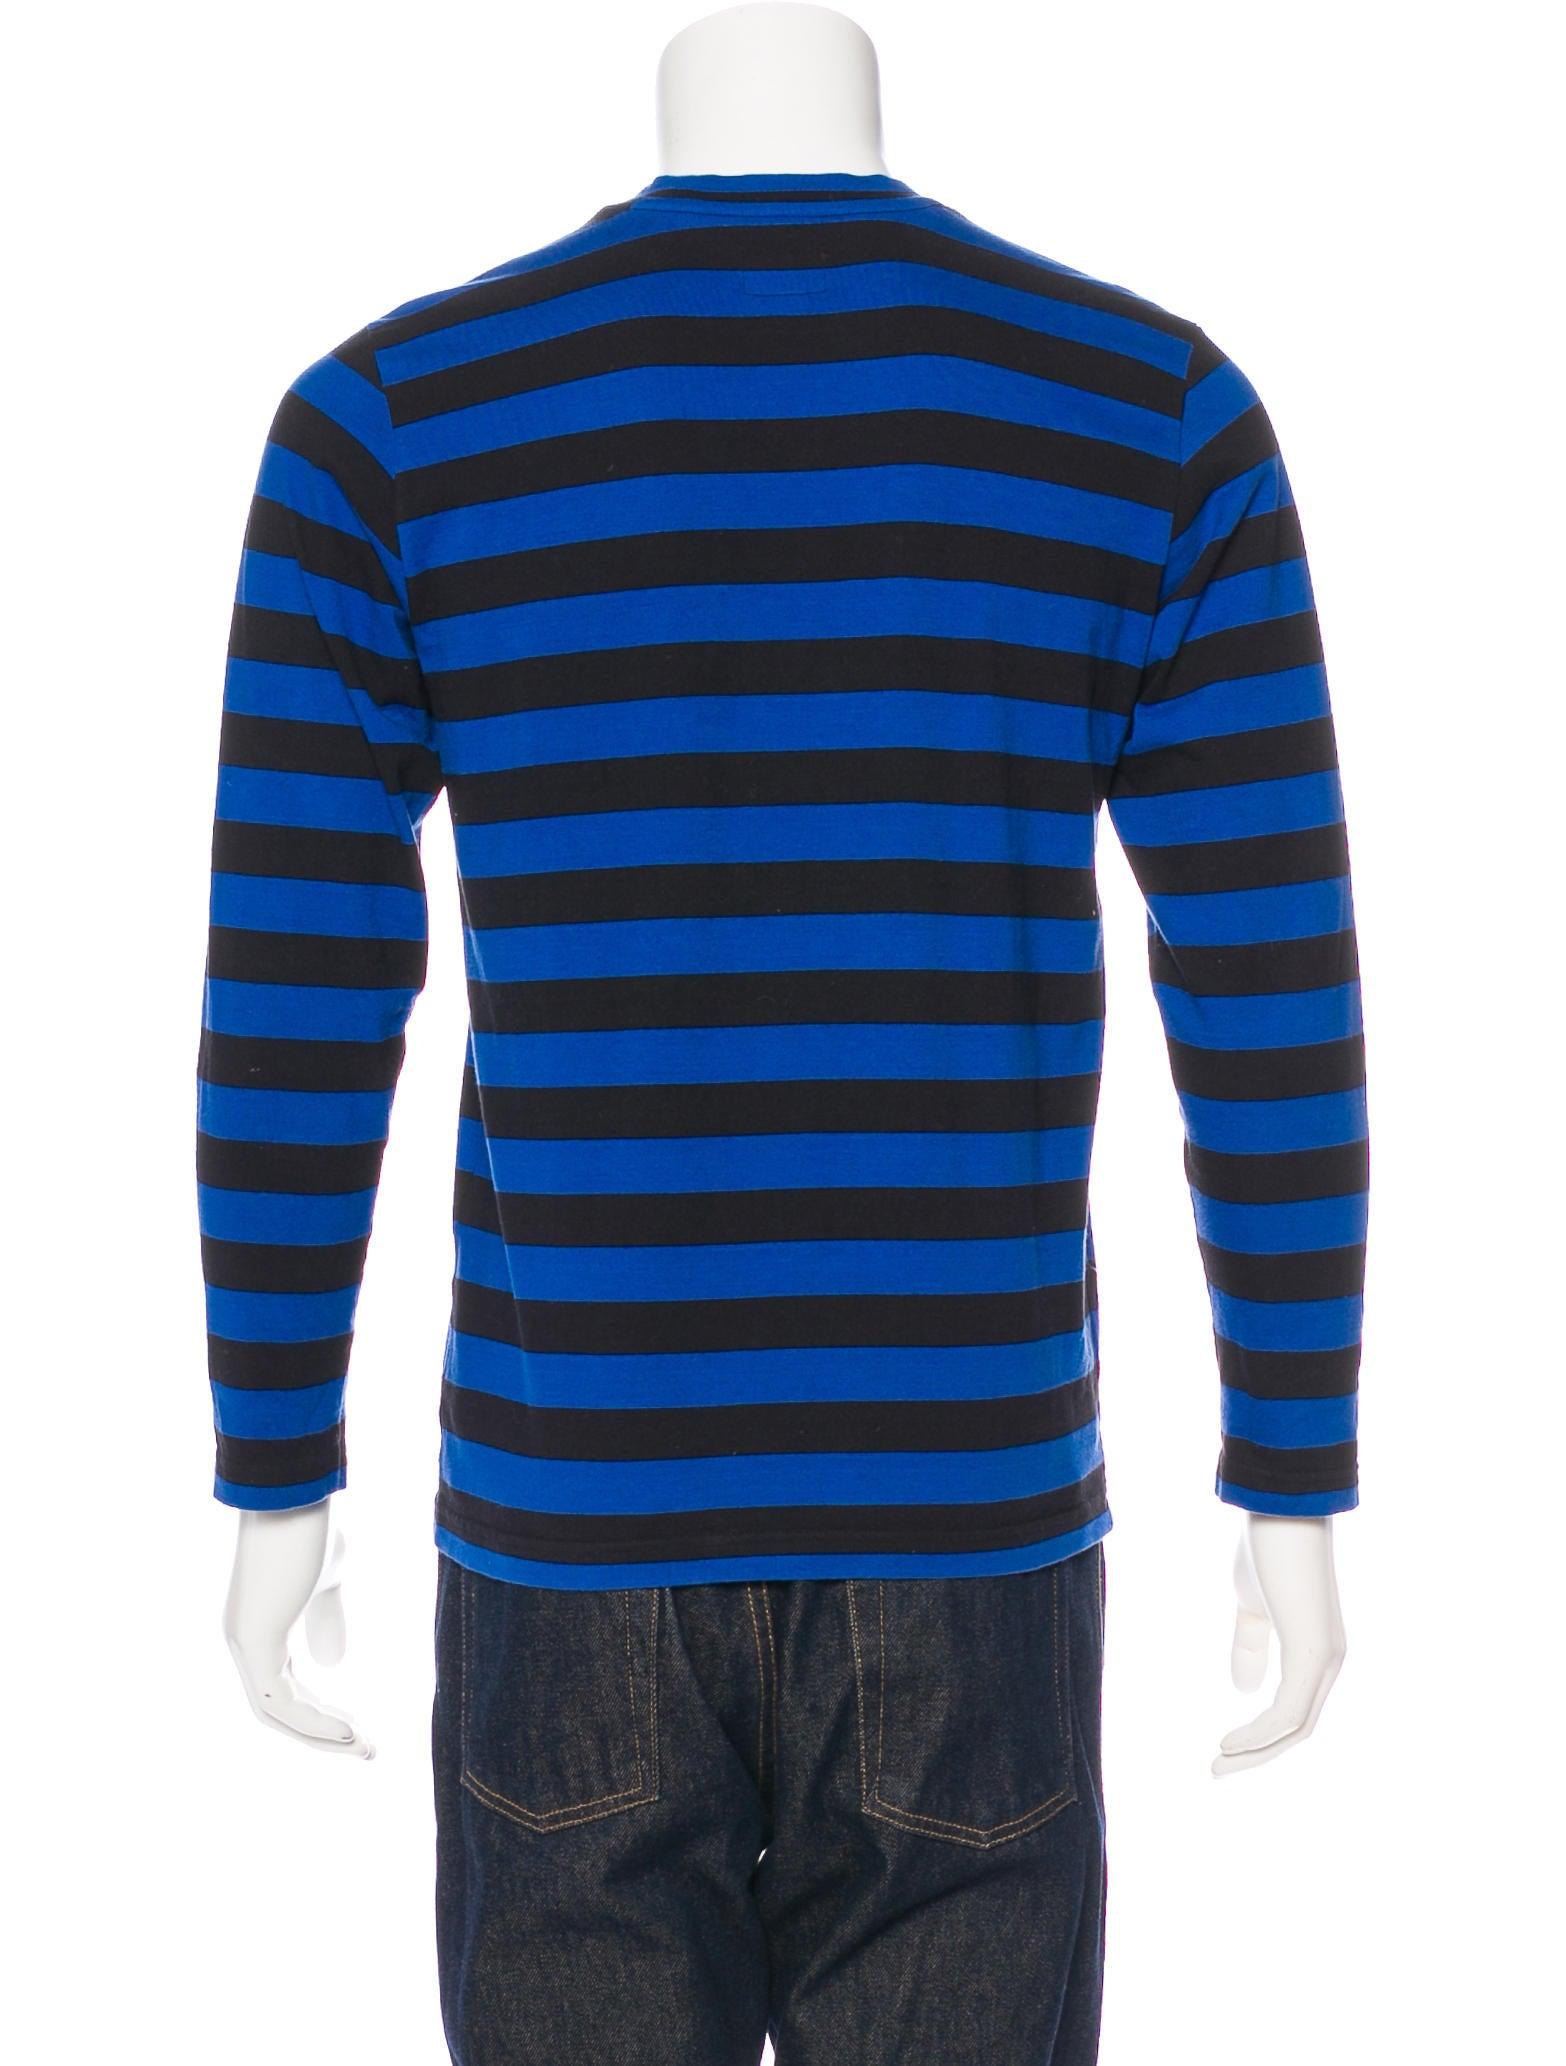 Supreme 2016 Striped T-Shirt - Clothing - WSPME20798  4f9fc3c7ab4e